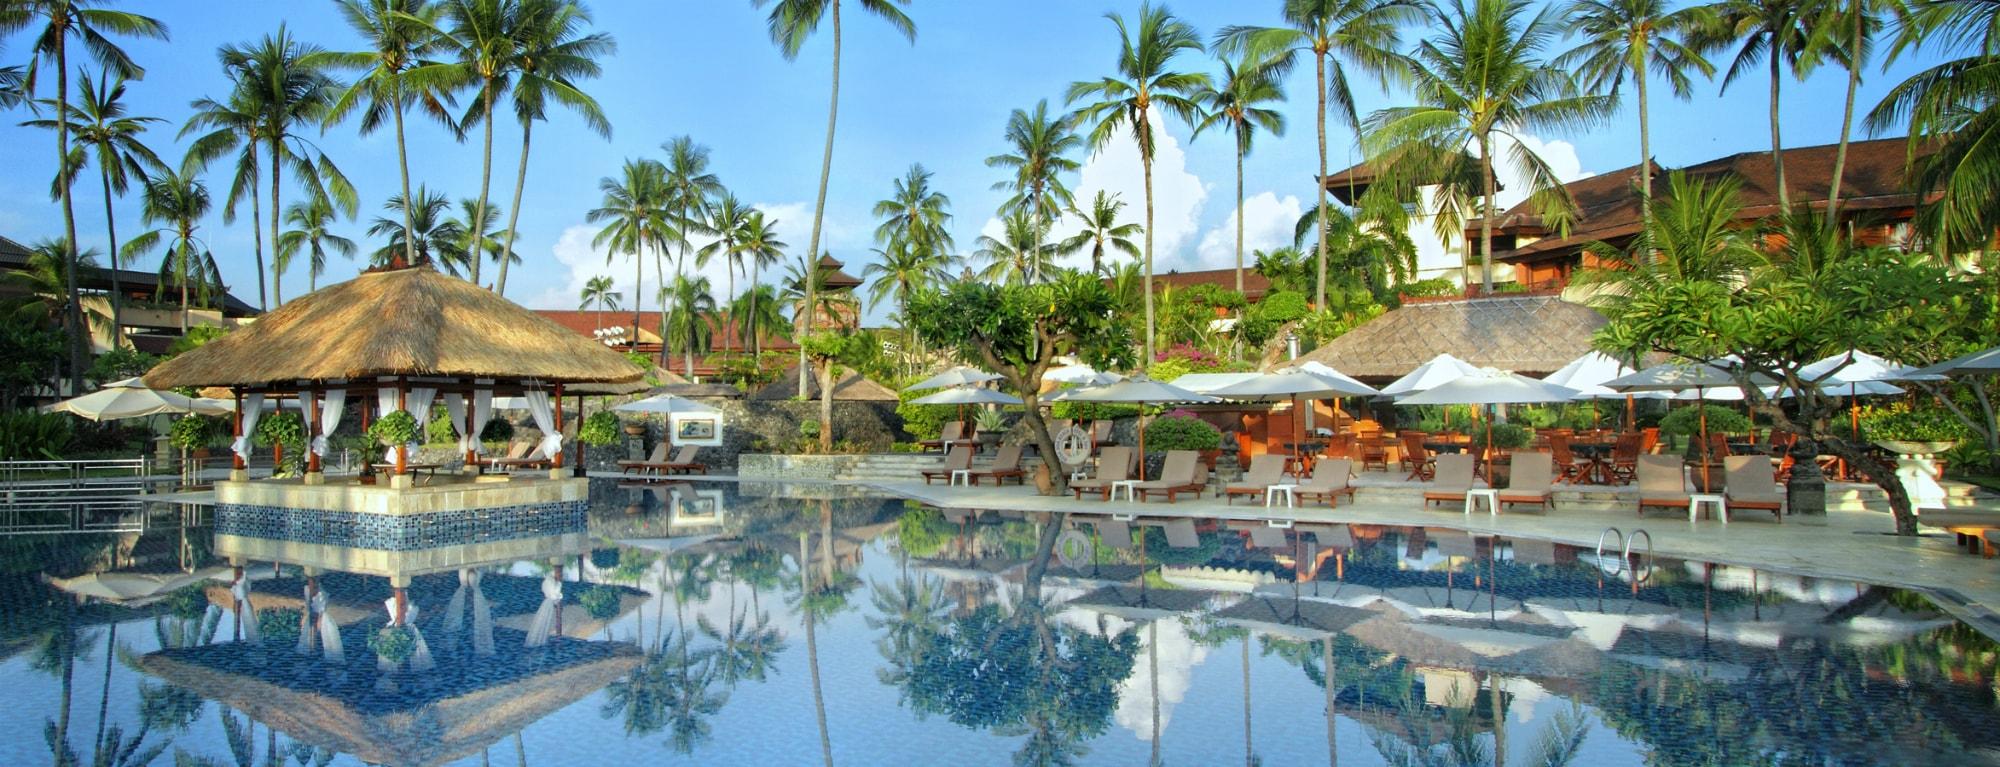 Nusa Dua Beach Hotel & Spa - justflybusiness.co.uk